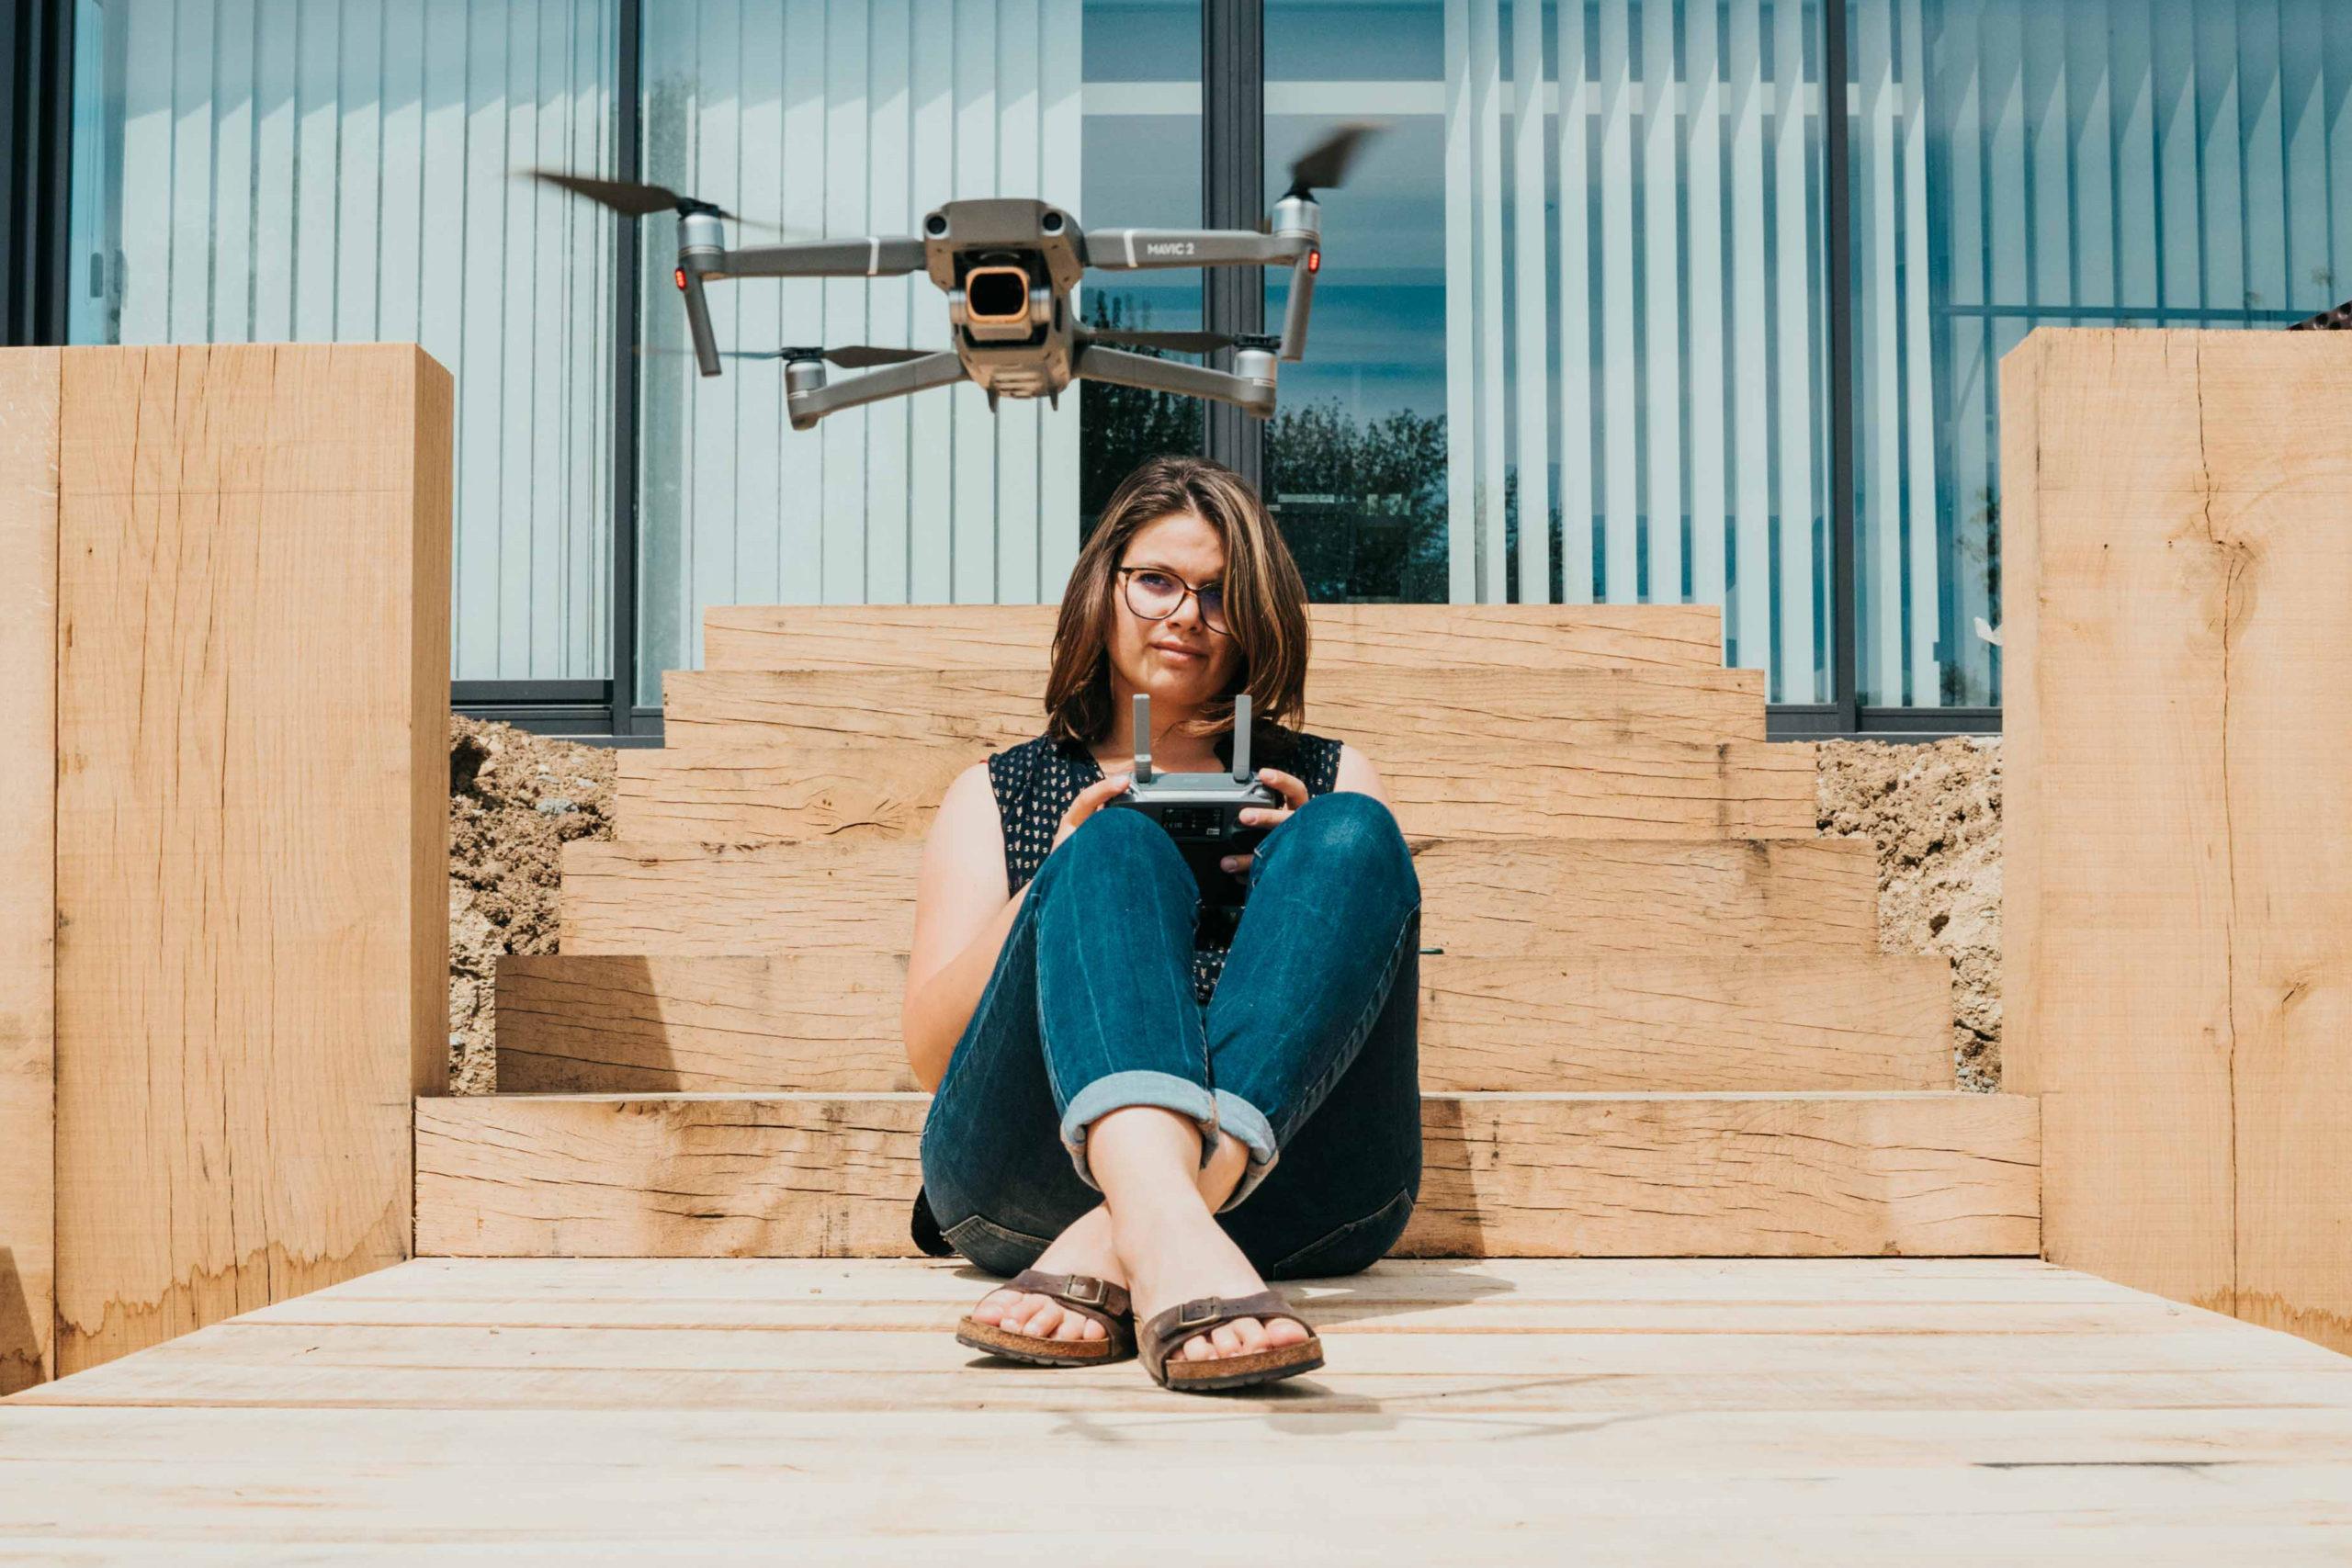 Drone Choisy Clap&Cut